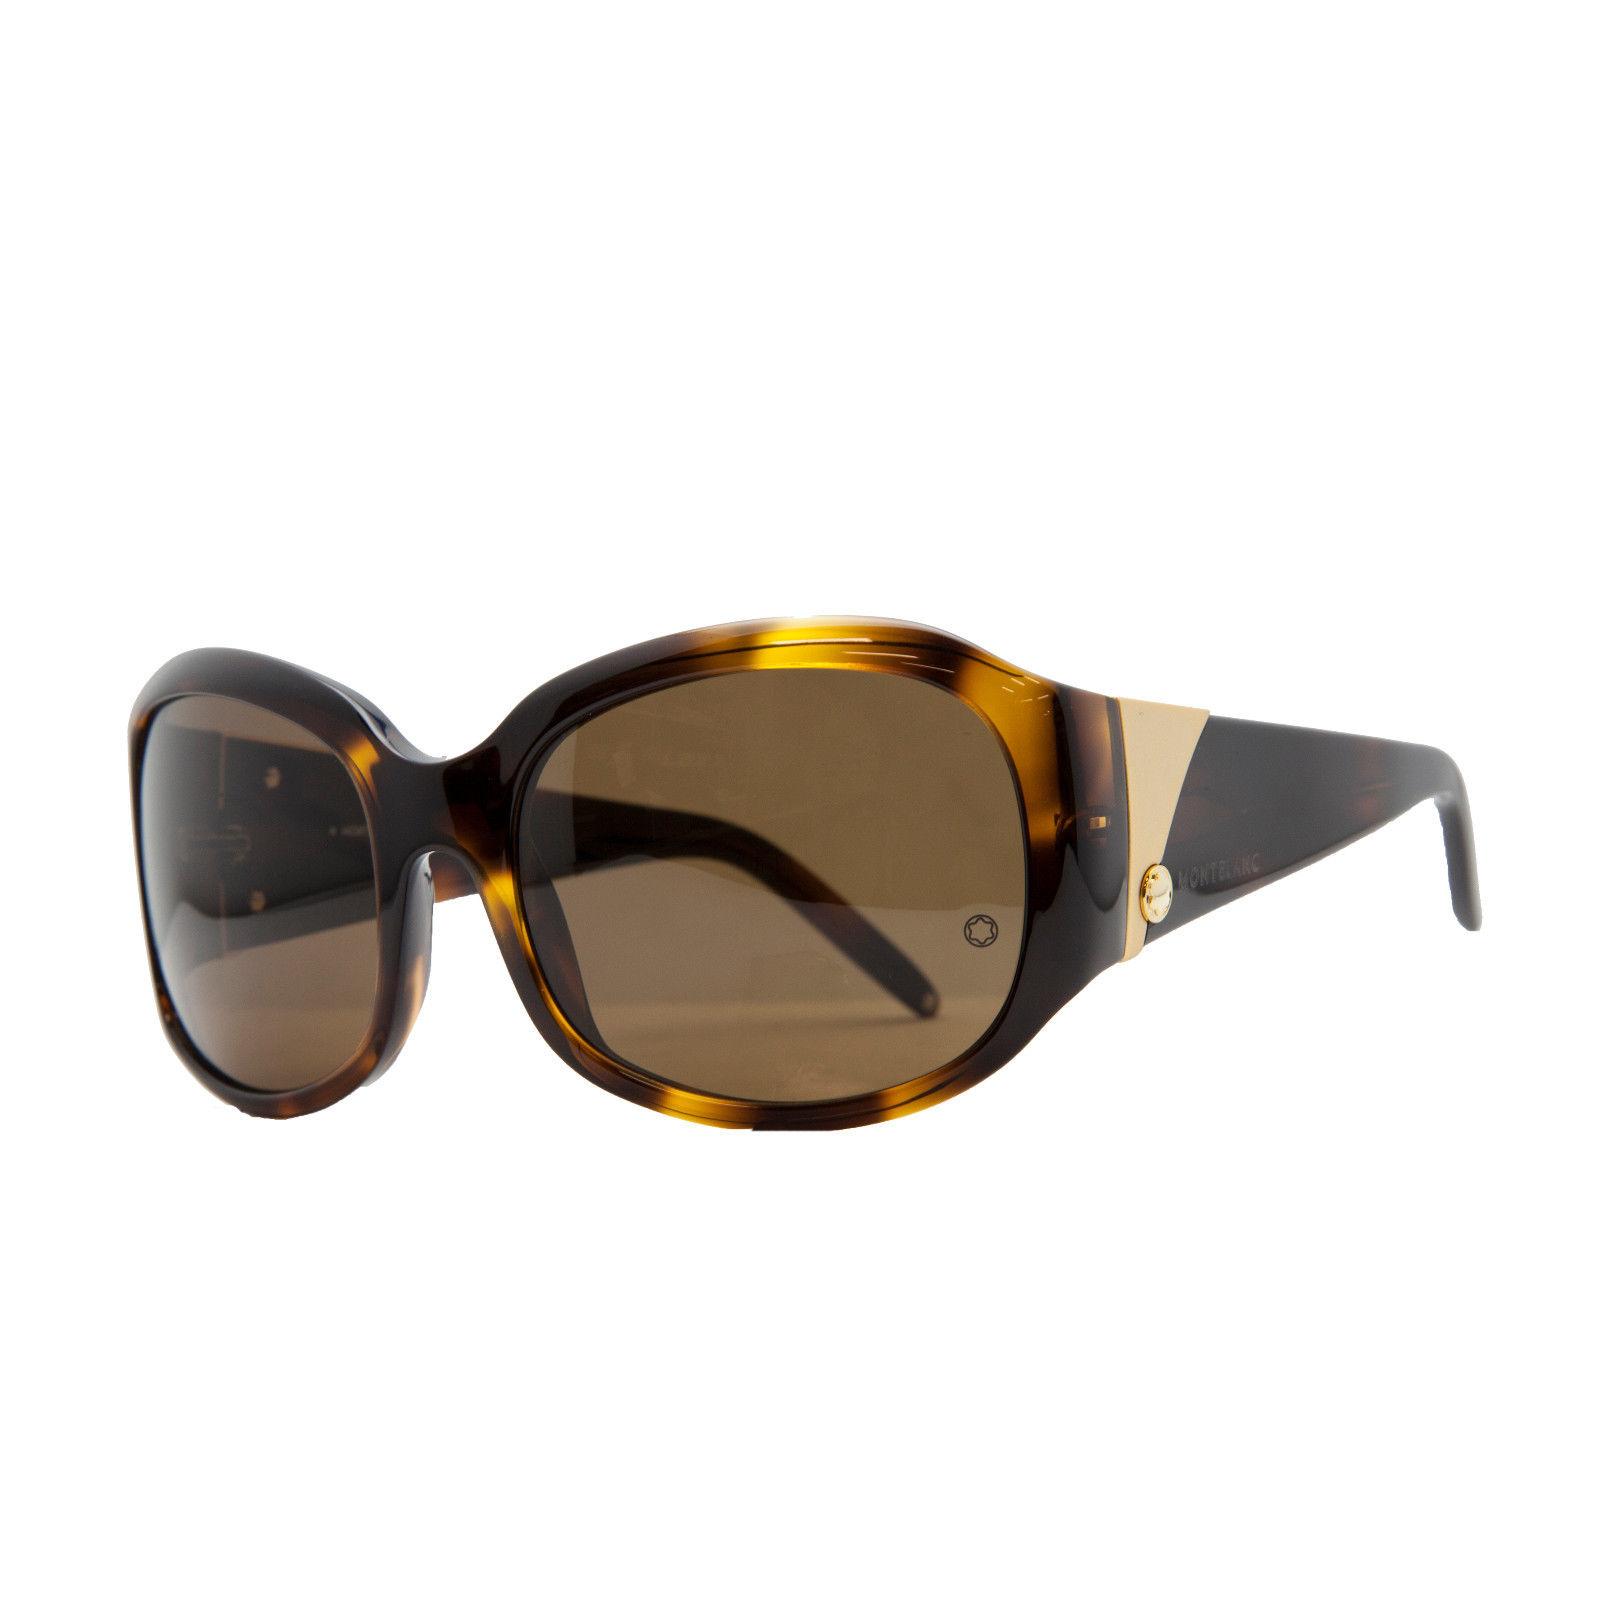 Mont Blanc MB 22S/S 096 Havana Oval Sunglasses